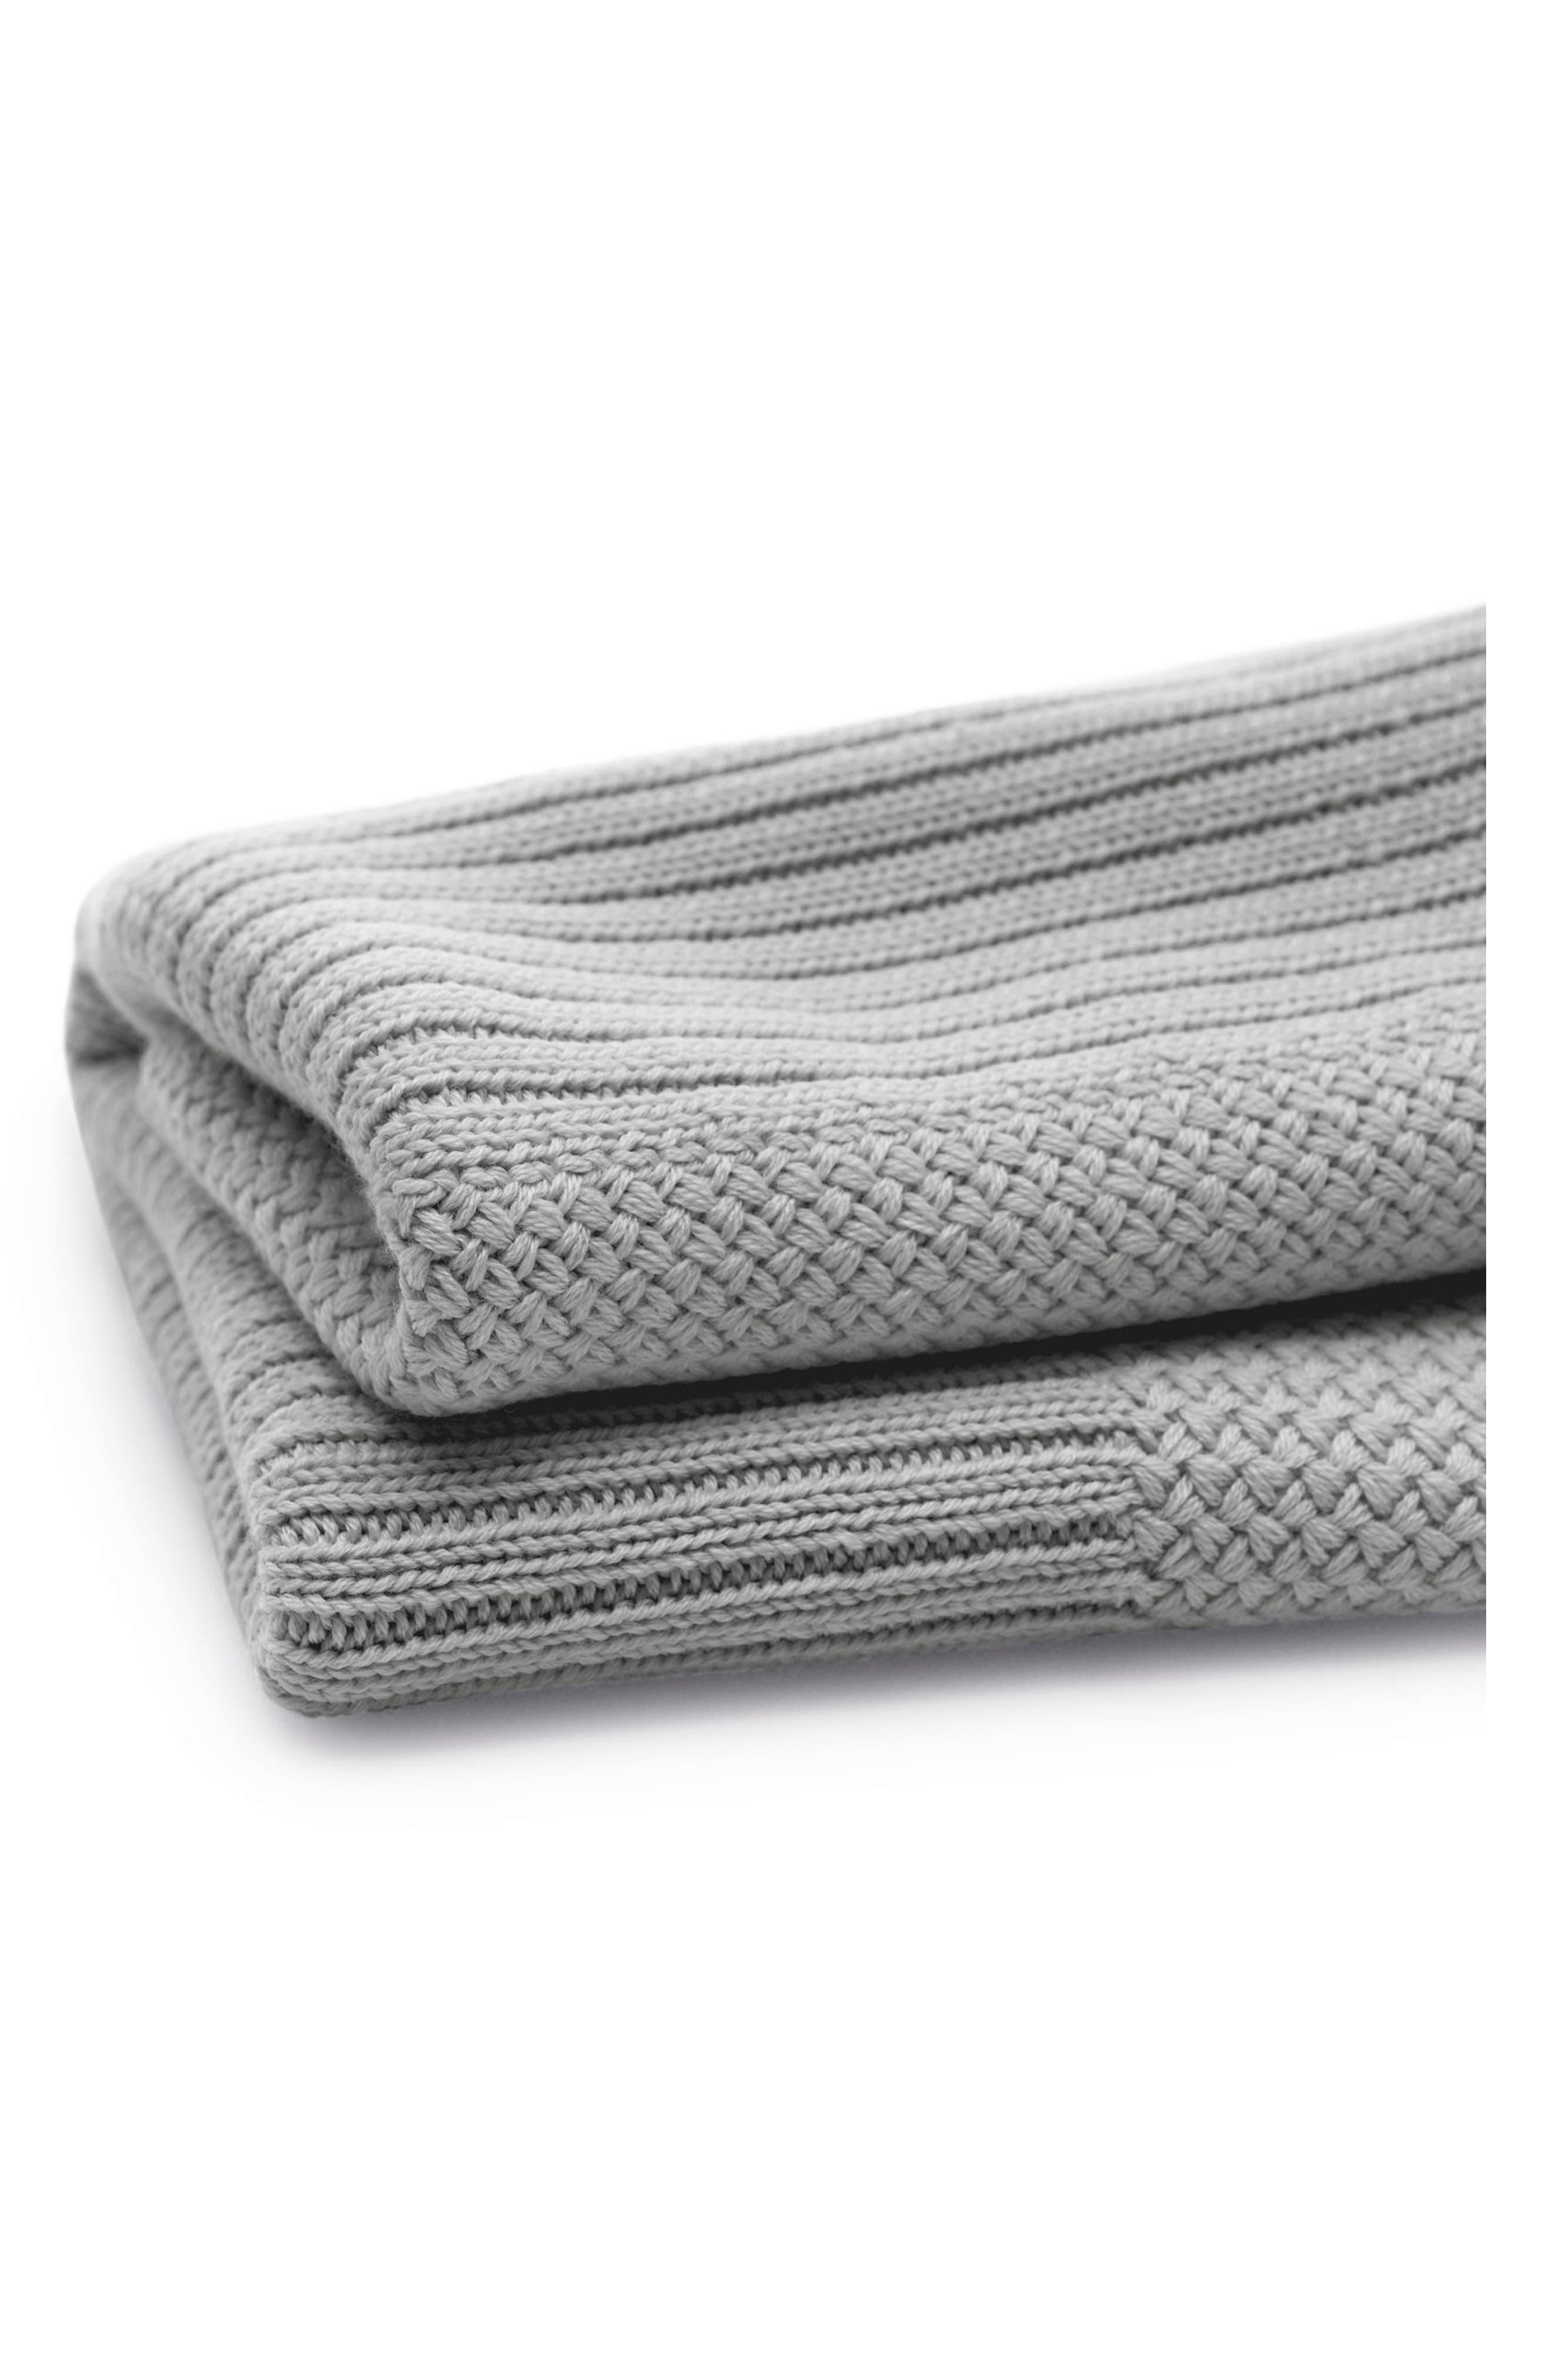 BUGABOO,                             Soft Wool Blanket,                             Alternate thumbnail 2, color,                             025